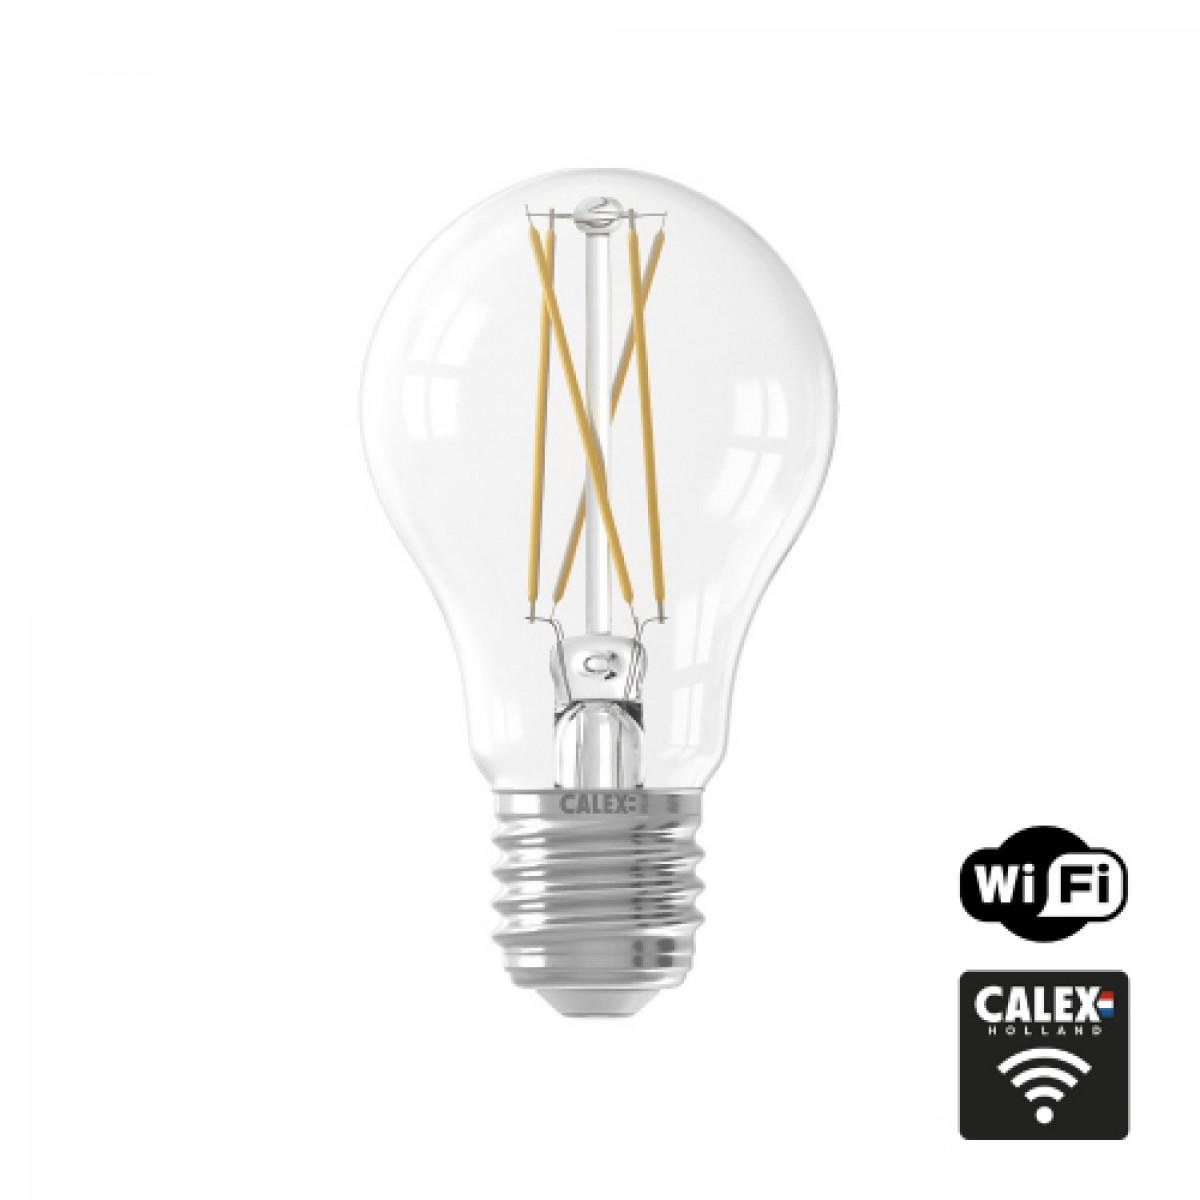 LED lichtbron incl. WIFI ambiance dimmer (429012-LED) - calex - Losse Sensoren en Bewegingsmelders